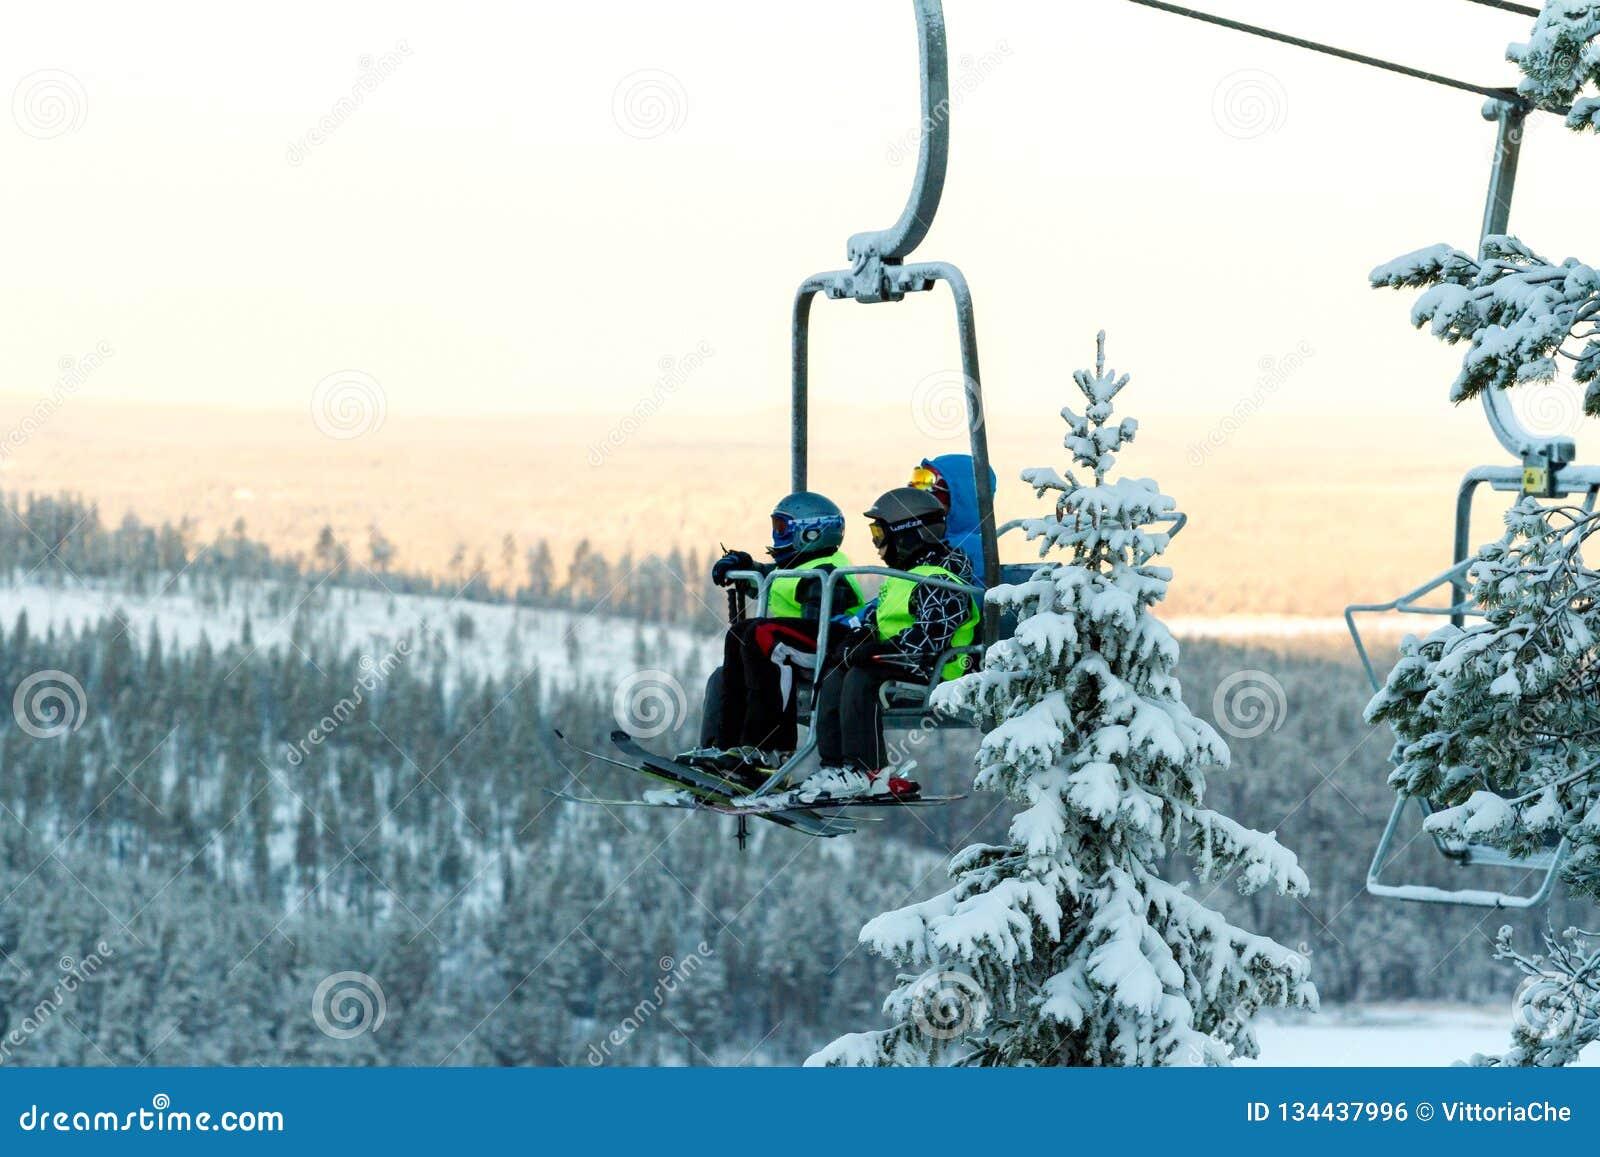 Ruka, Φινλανδία - 27 Νοεμβρίου 2012: Οι σκιέρ κάθονται στον ανελκυστήρα καρεκλών στο χιονοδρομικό κέντρο Ruka στο πάγωμα της ημέρ